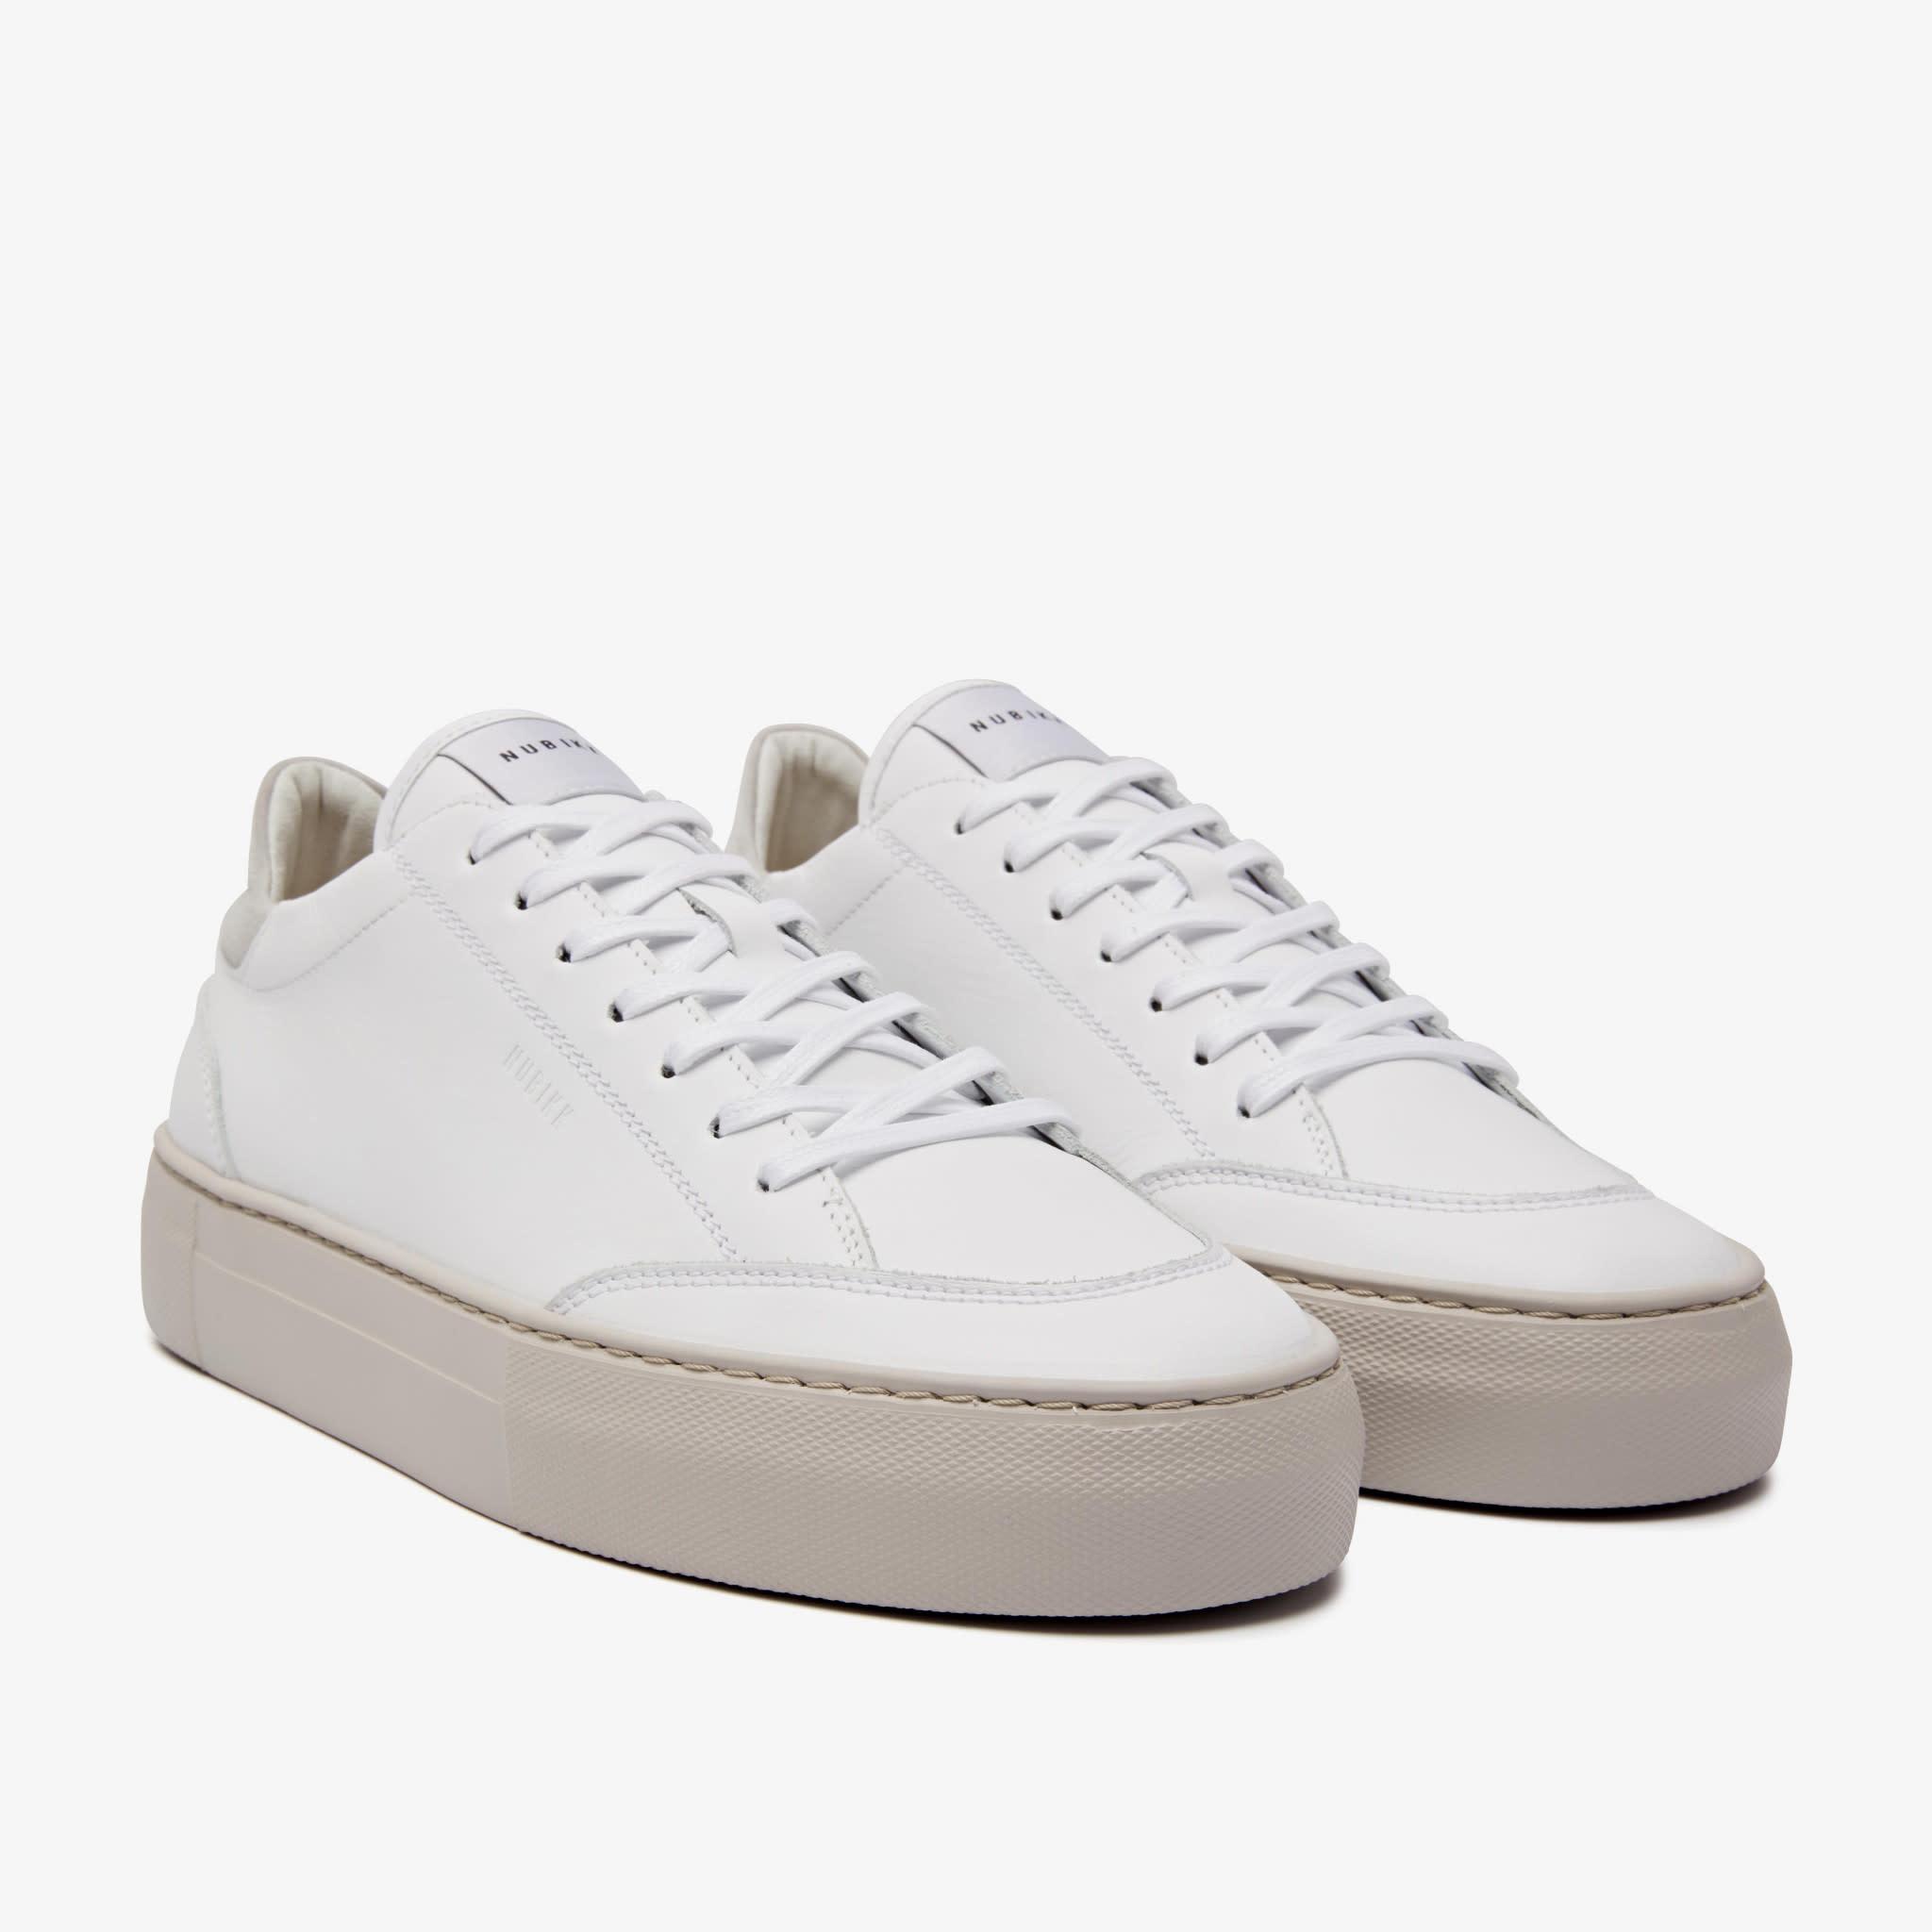 Jagger Tora white Leather Multicolor-3